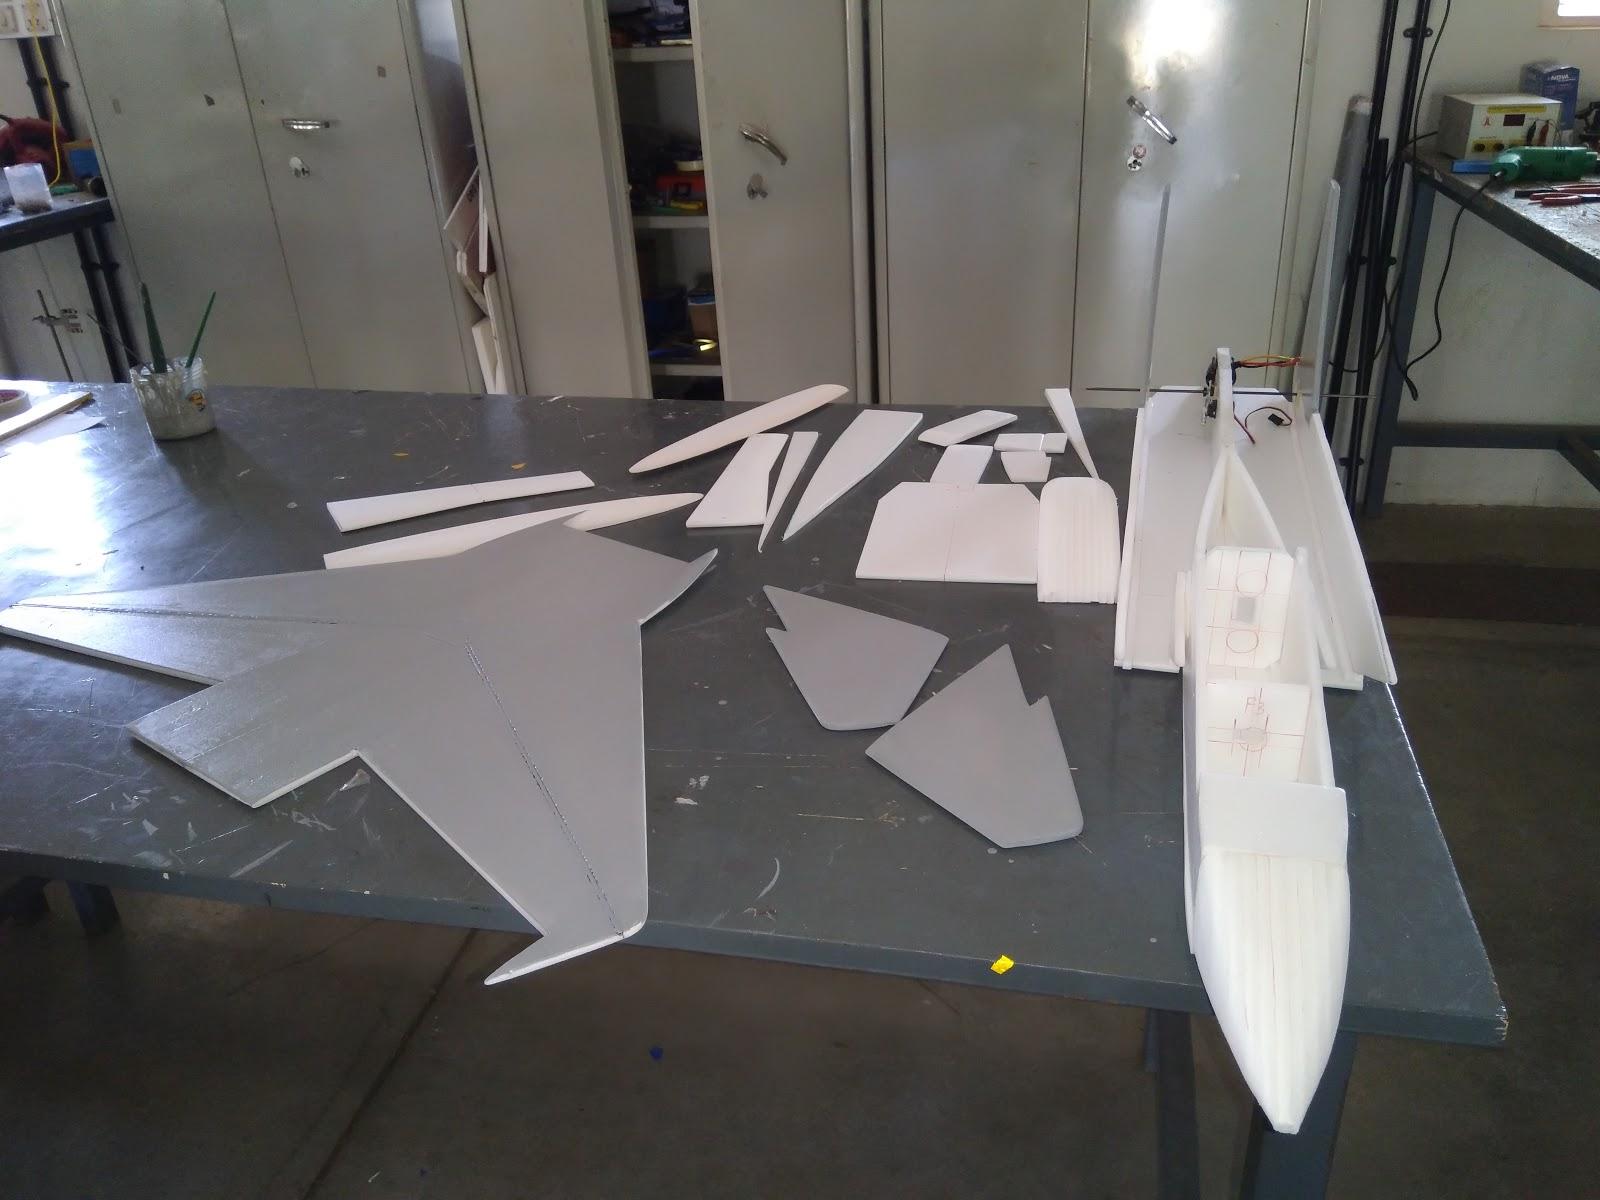 F15 Eagle - Depron Foam | Gforce-RC Planes